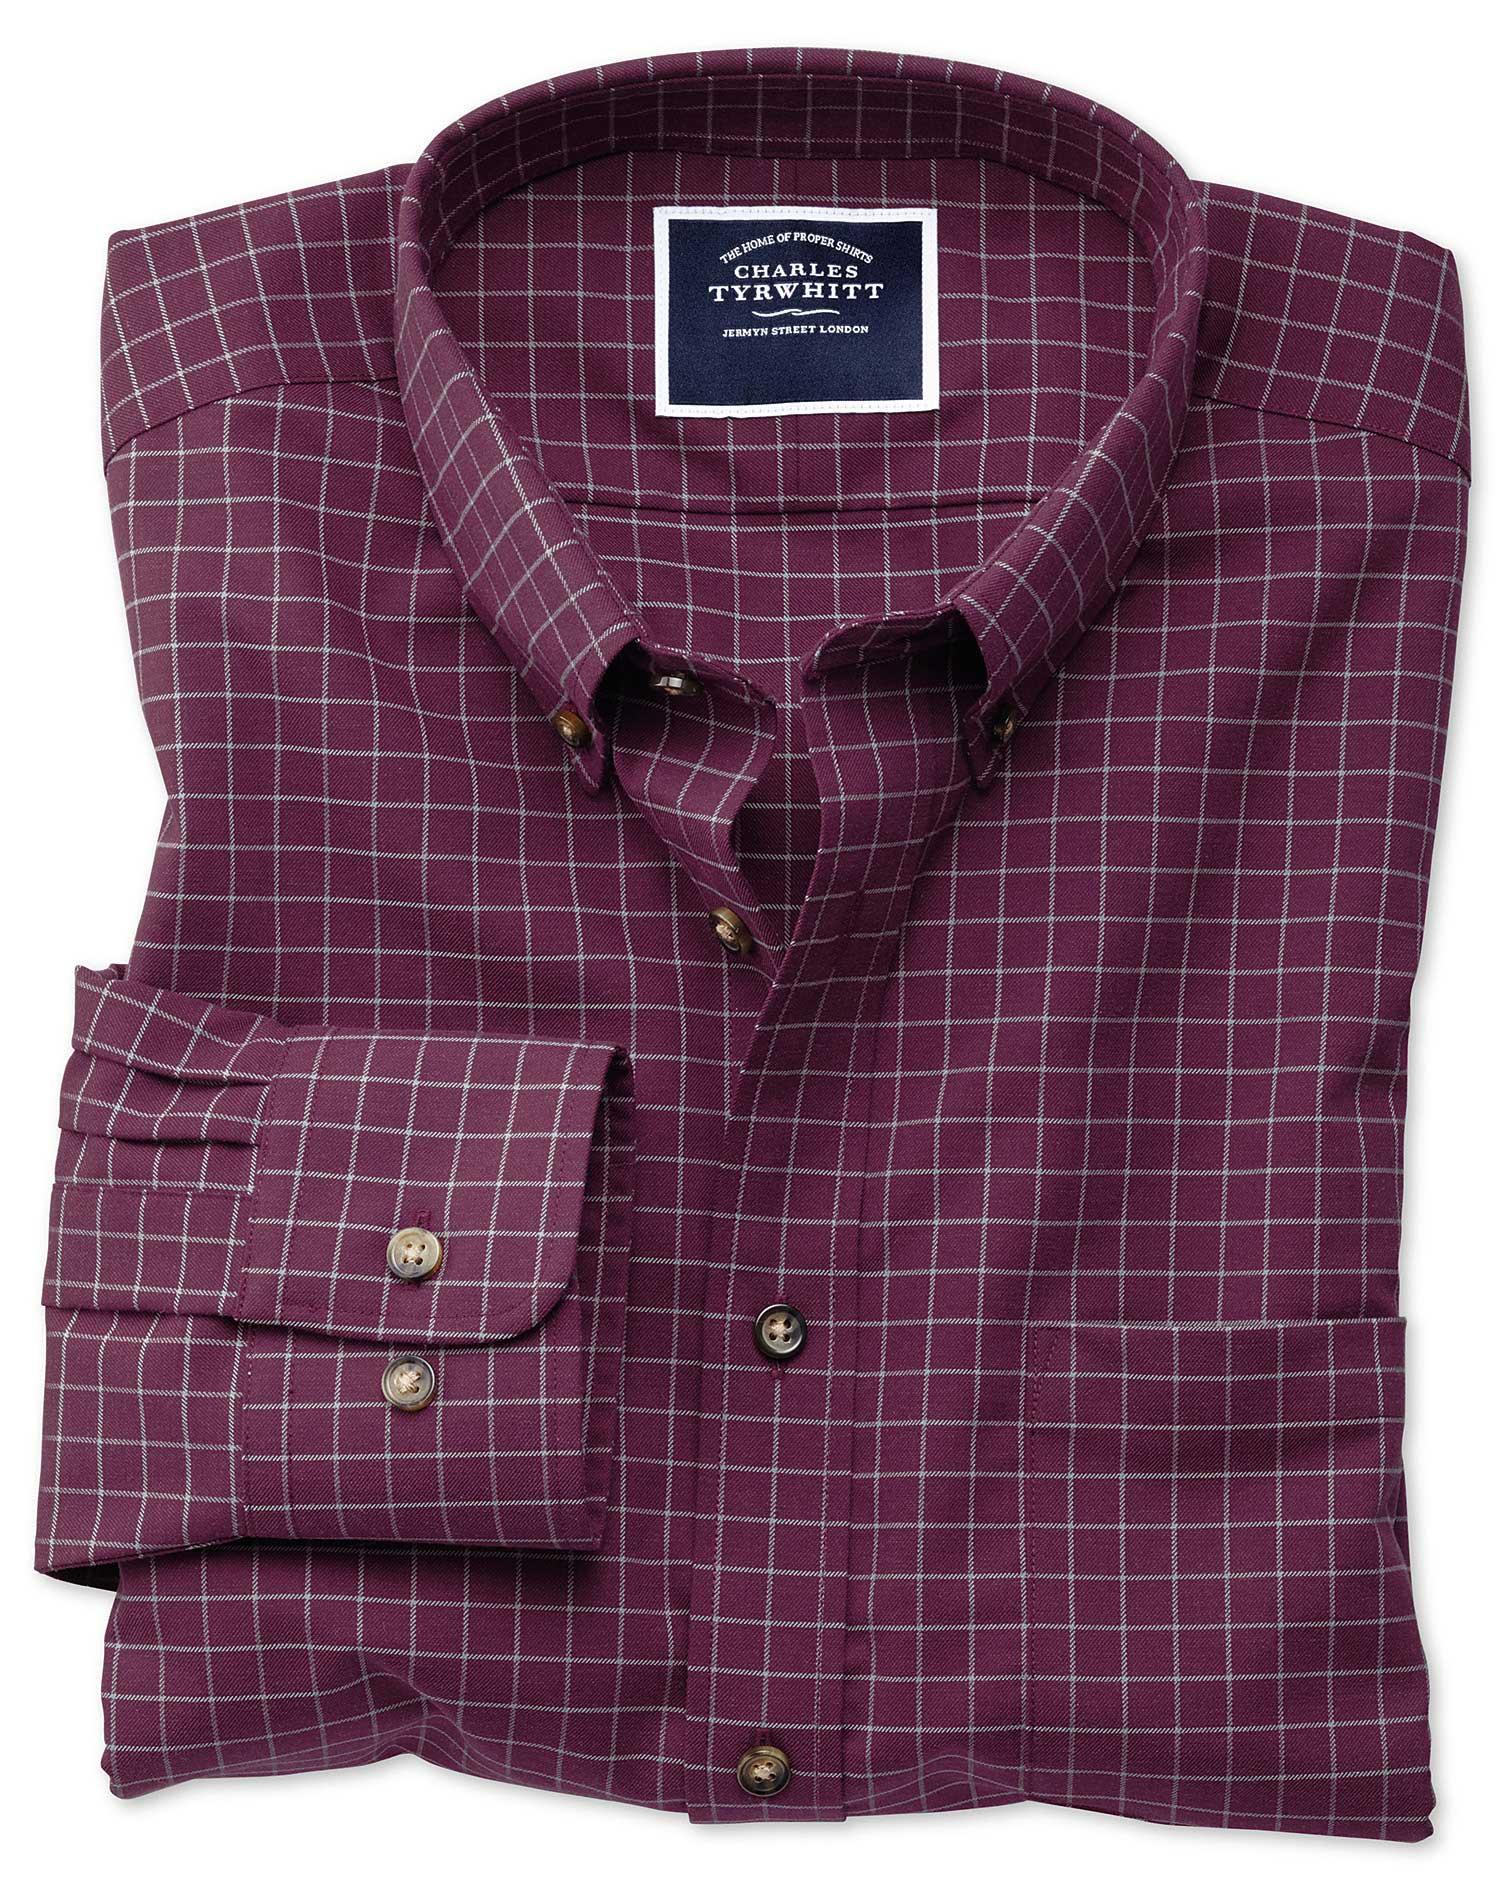 Slim Fit Non-Iron Berry Check Twill Cotton Shirt Single Cuff Size XL by Charles Tyrwhitt